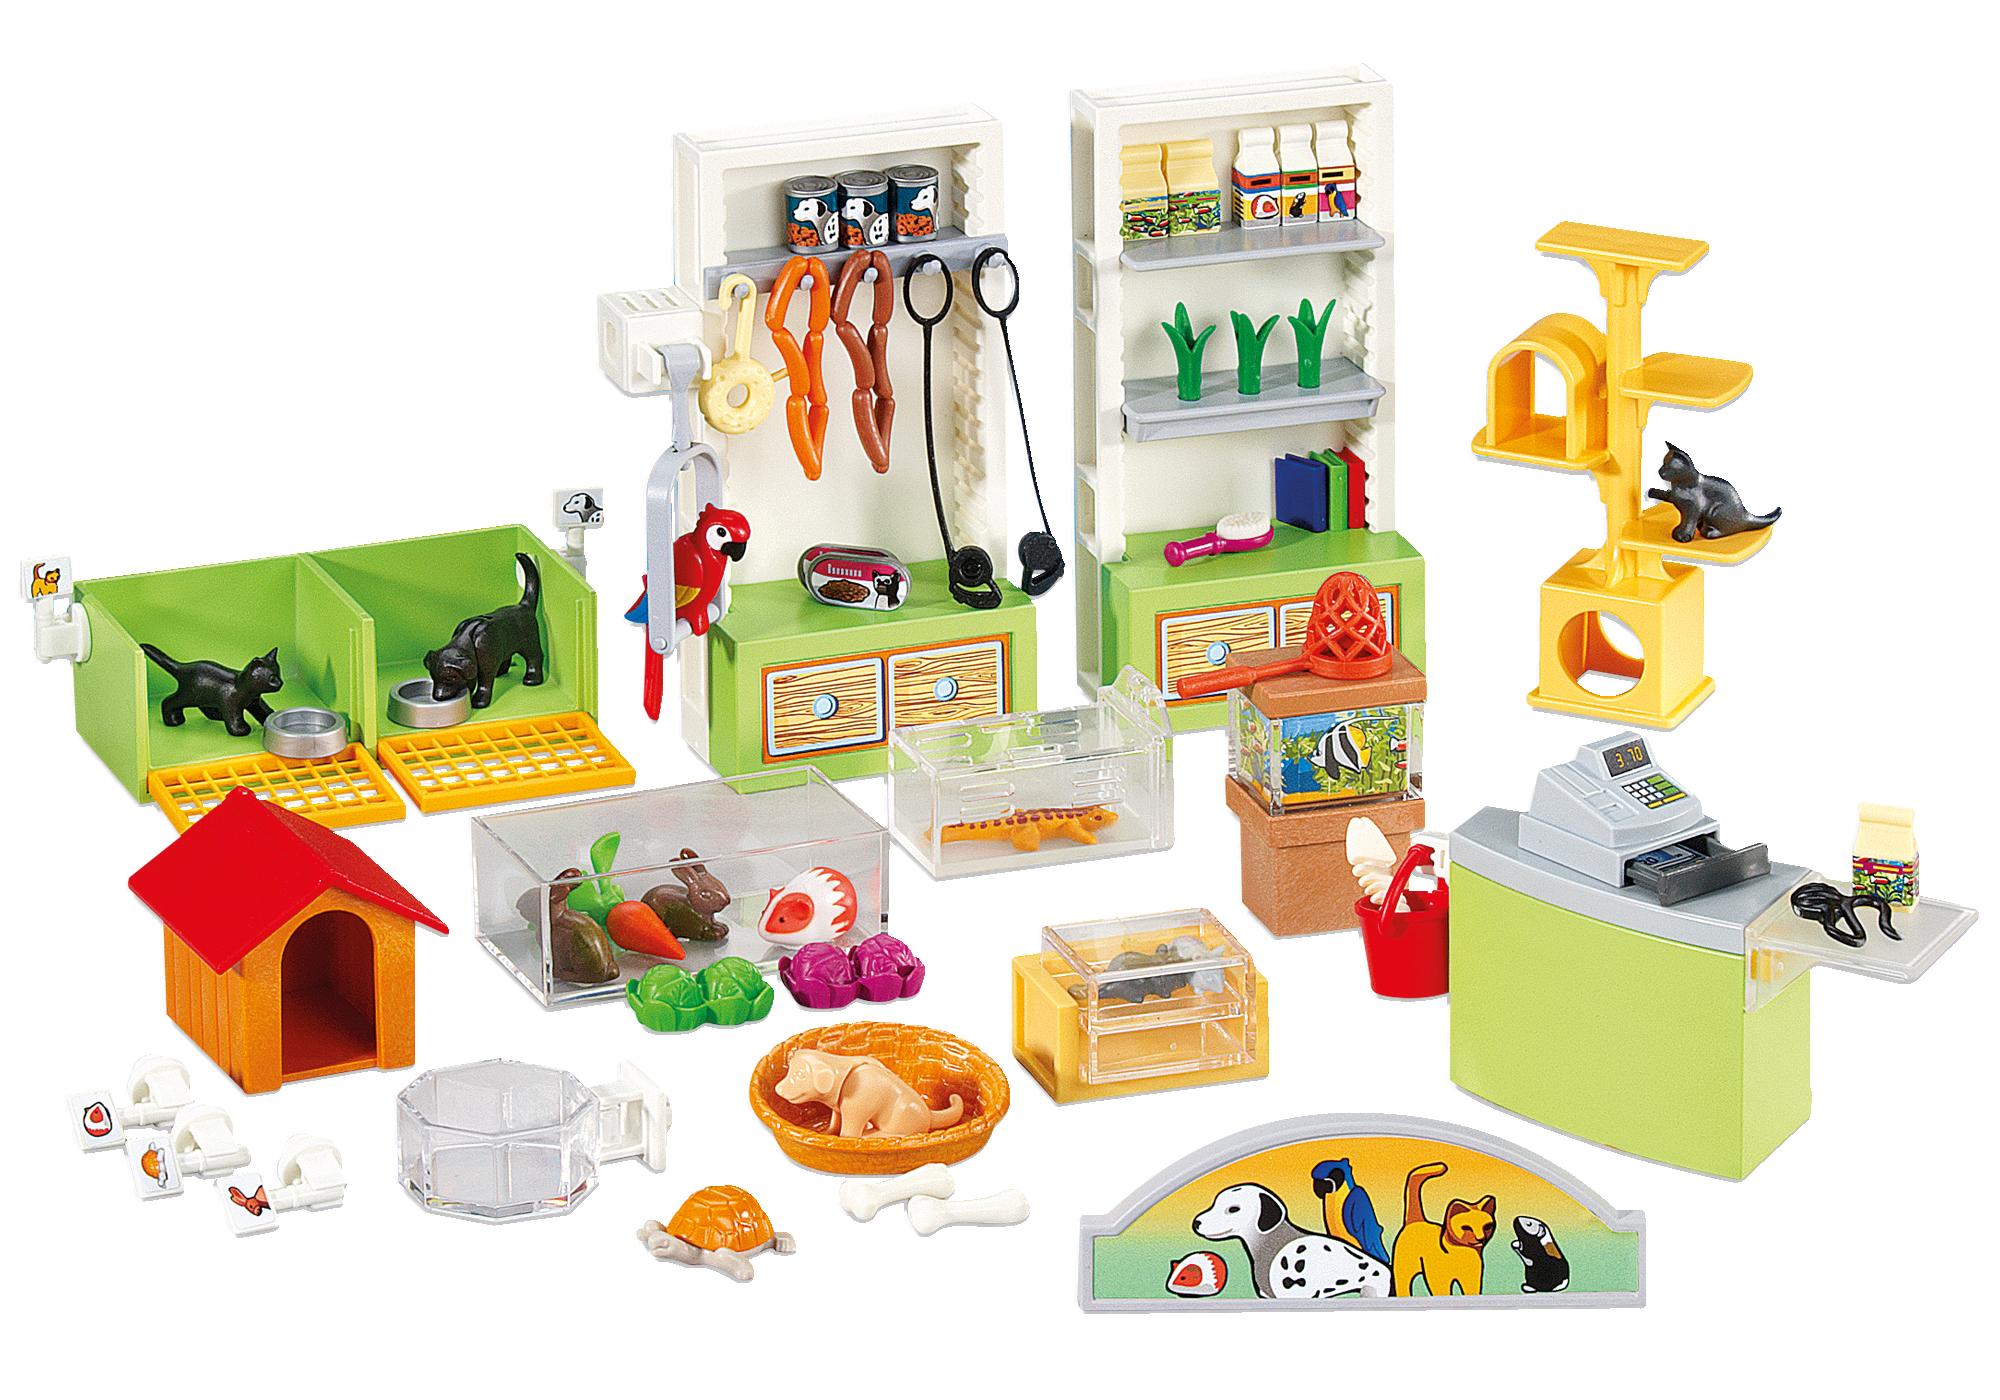 http://media.playmobil.com/i/playmobil/6221_product_detail